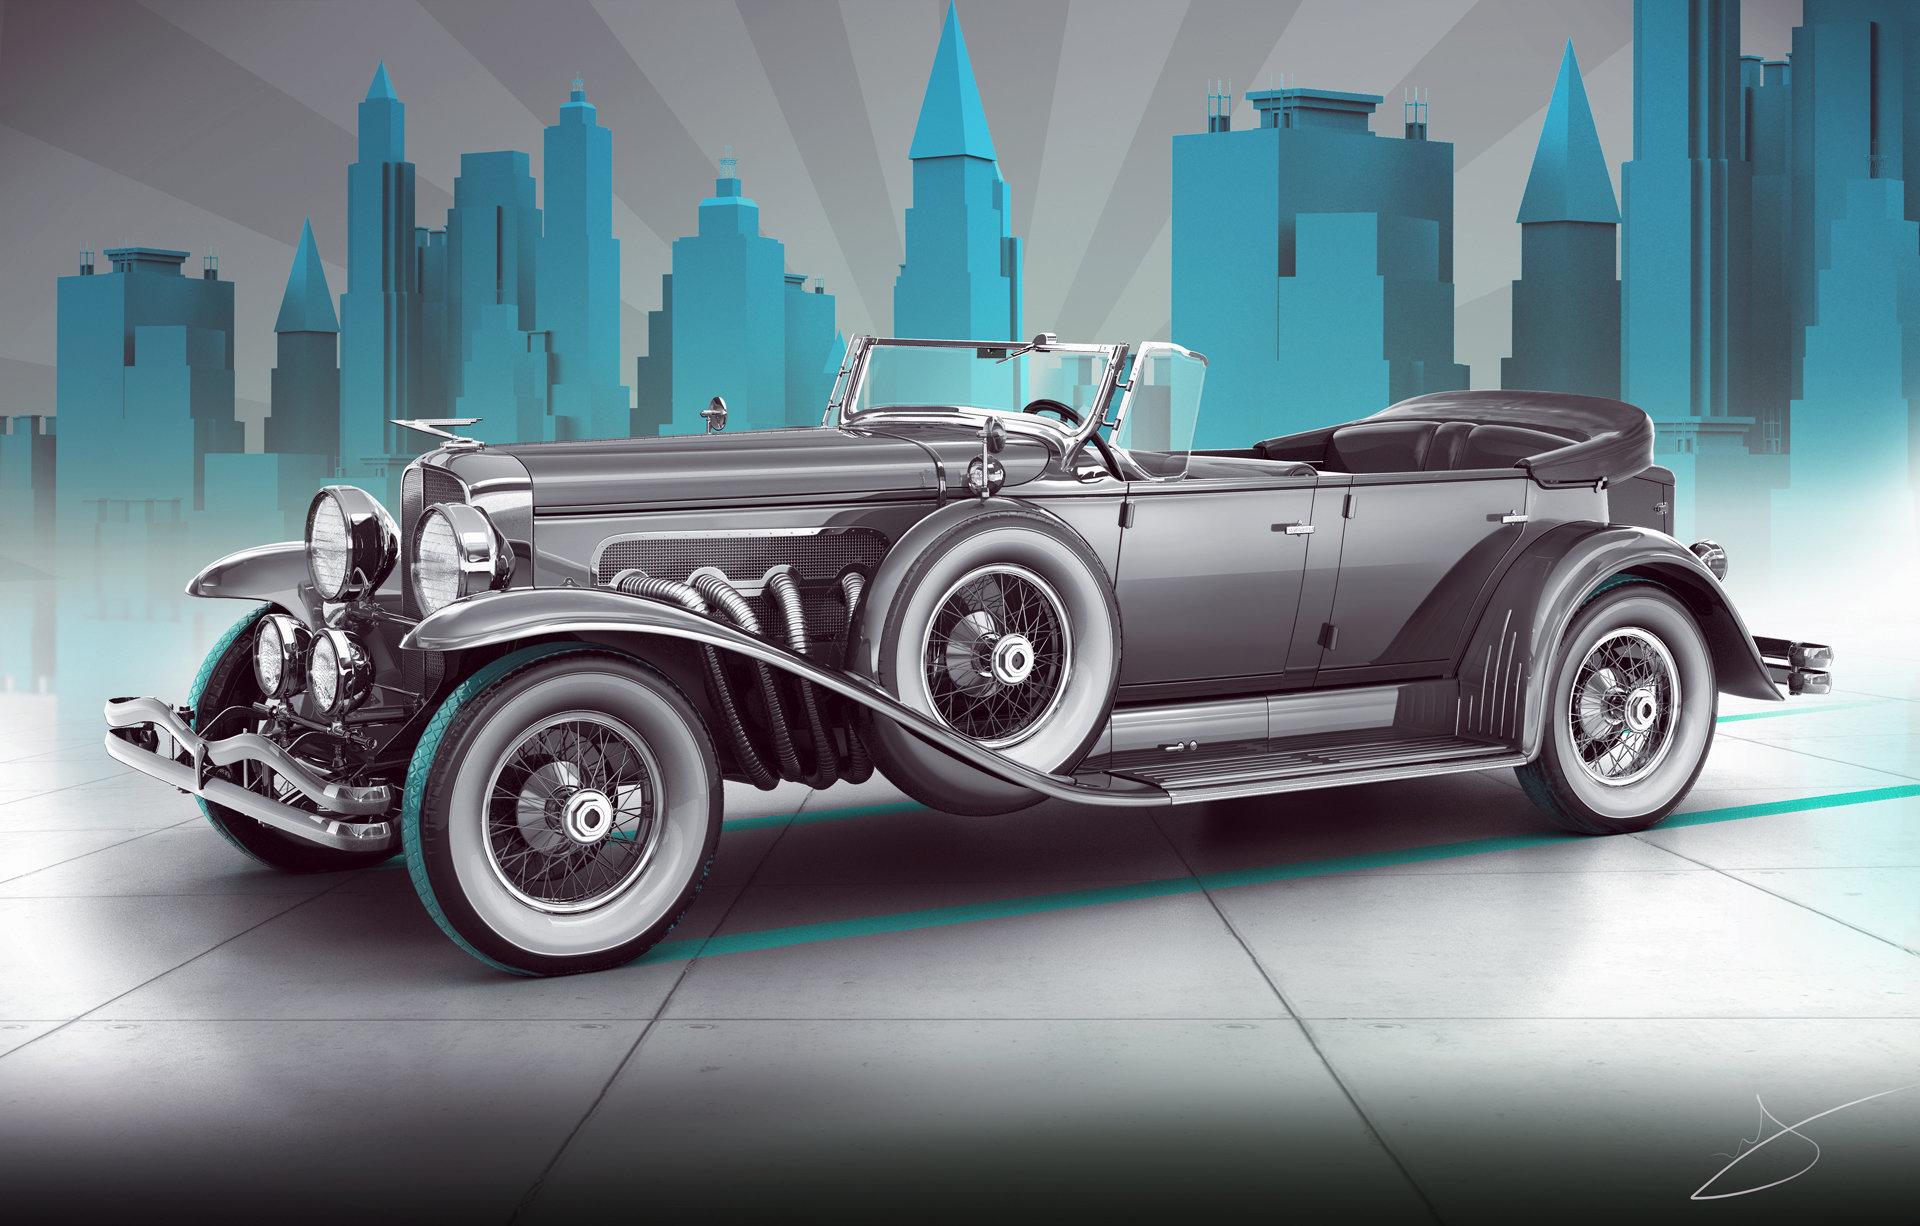 Alexandr novitskiy 1929 duesenberg model j dual cowl phaeton style 02